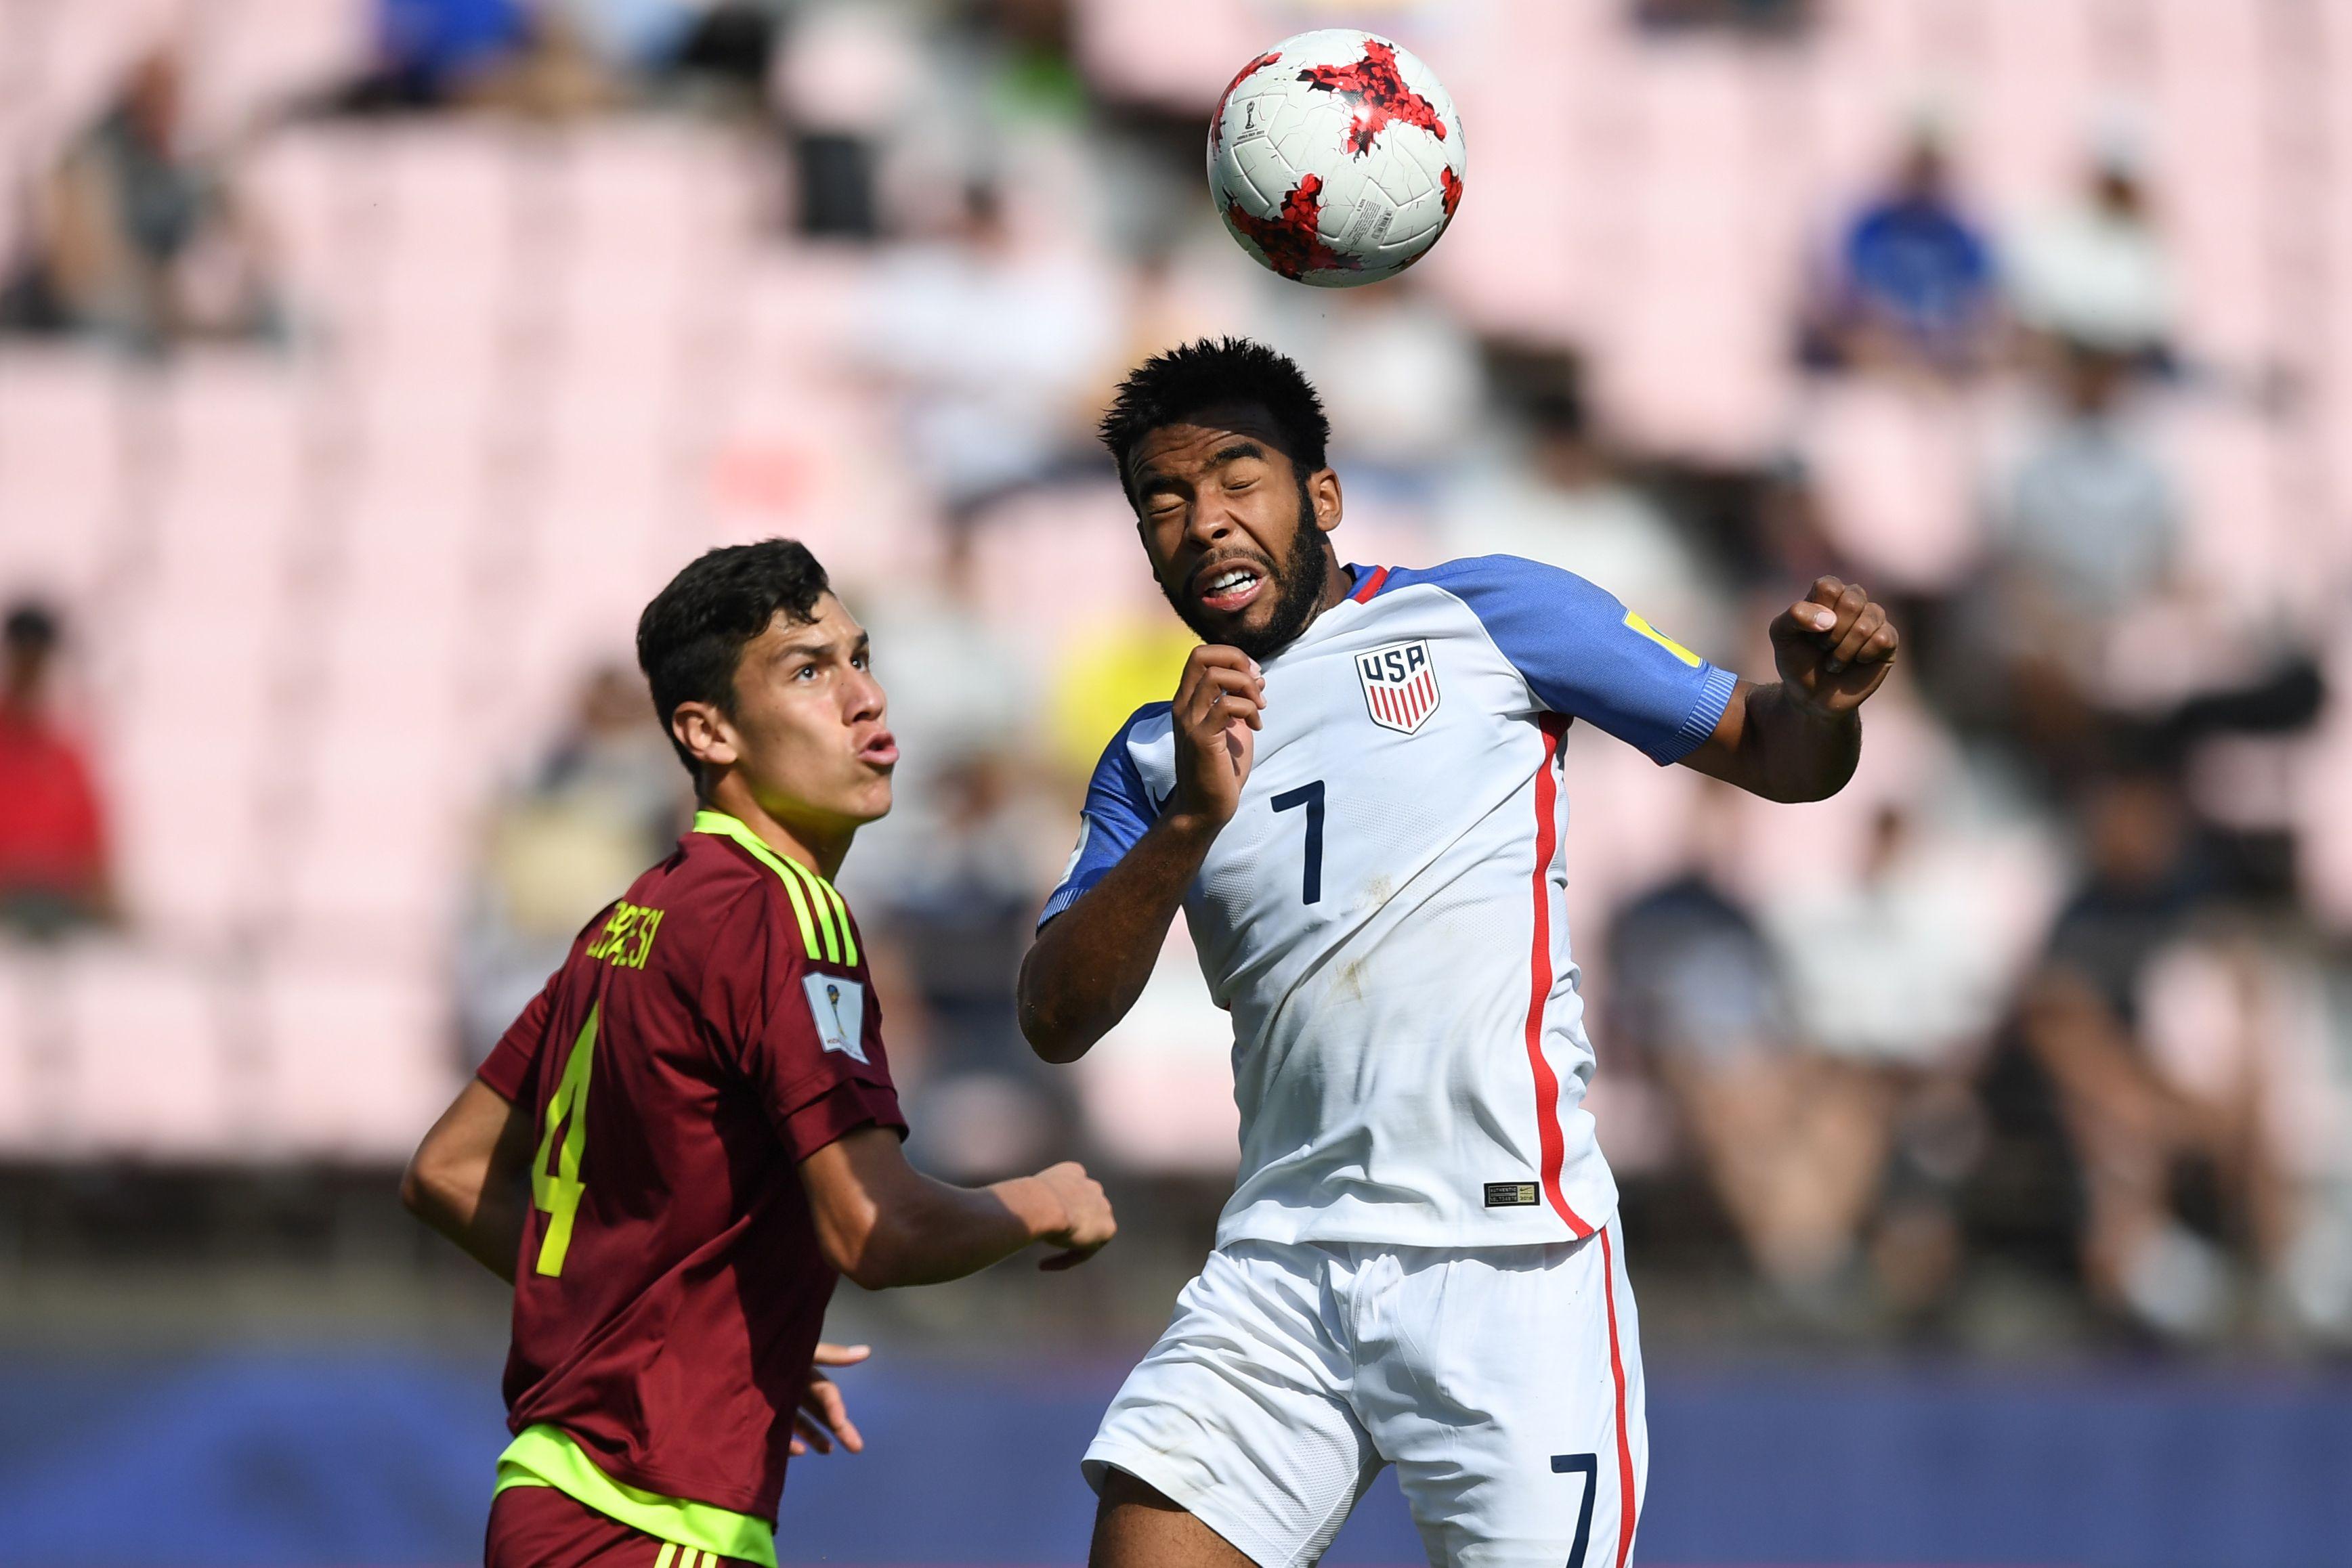 FBL-U20-WC-2017-VEN-USA